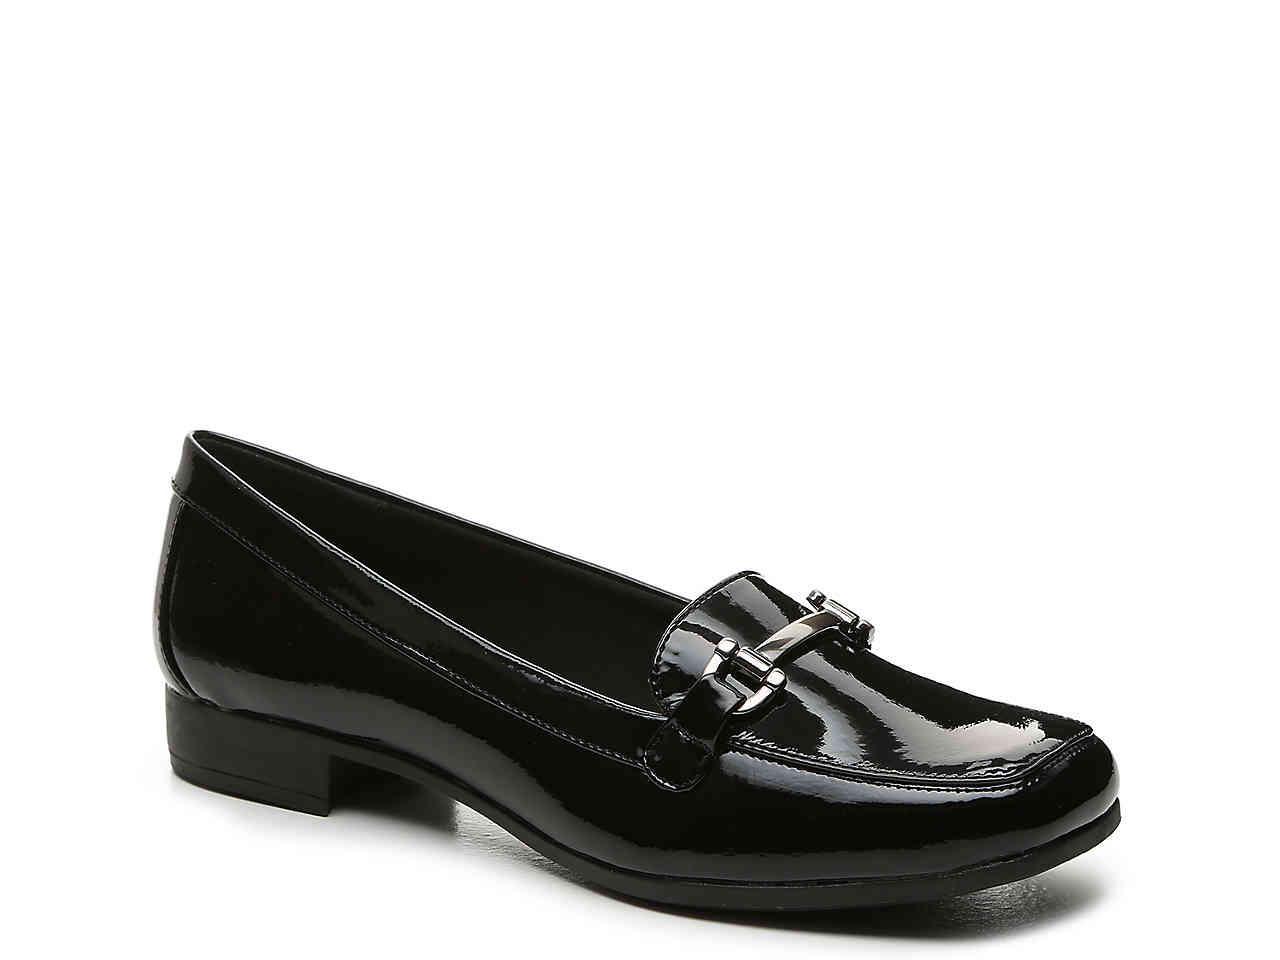 935d2604190 Lyst - Anne Klein Varina Loafer in Black - Save 49%